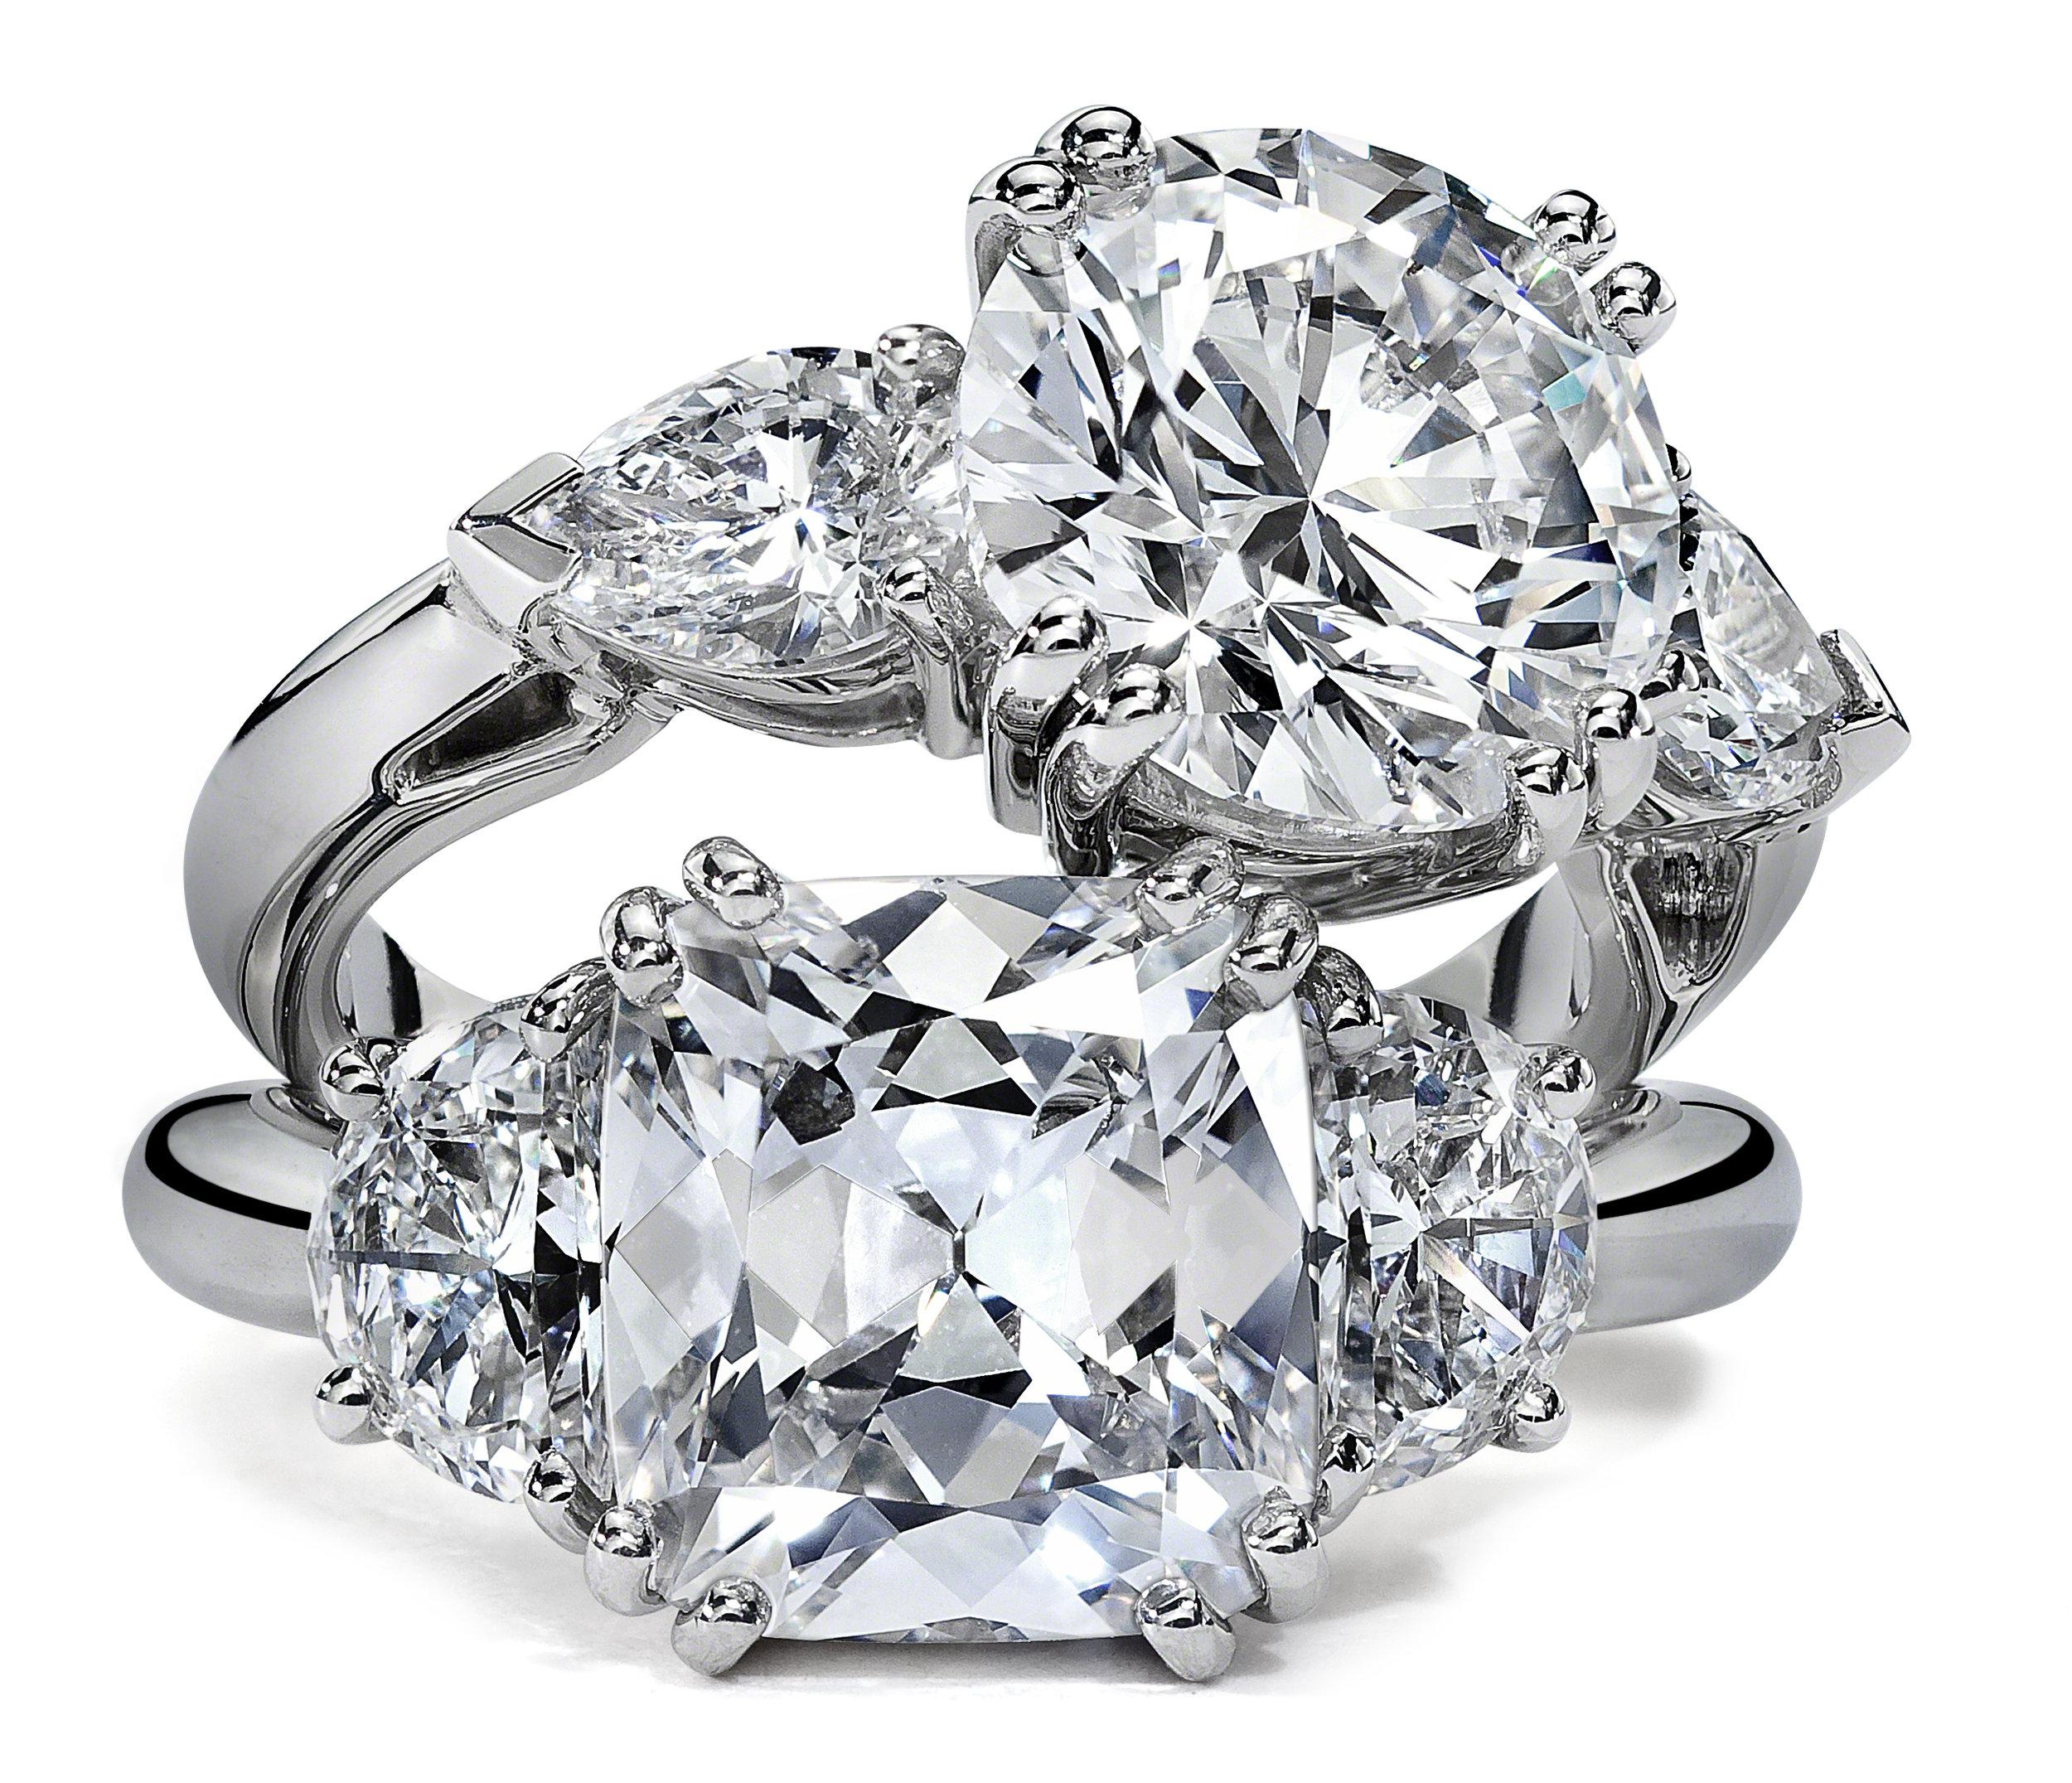 02348_Jewelry_Stock_Photography.jpg